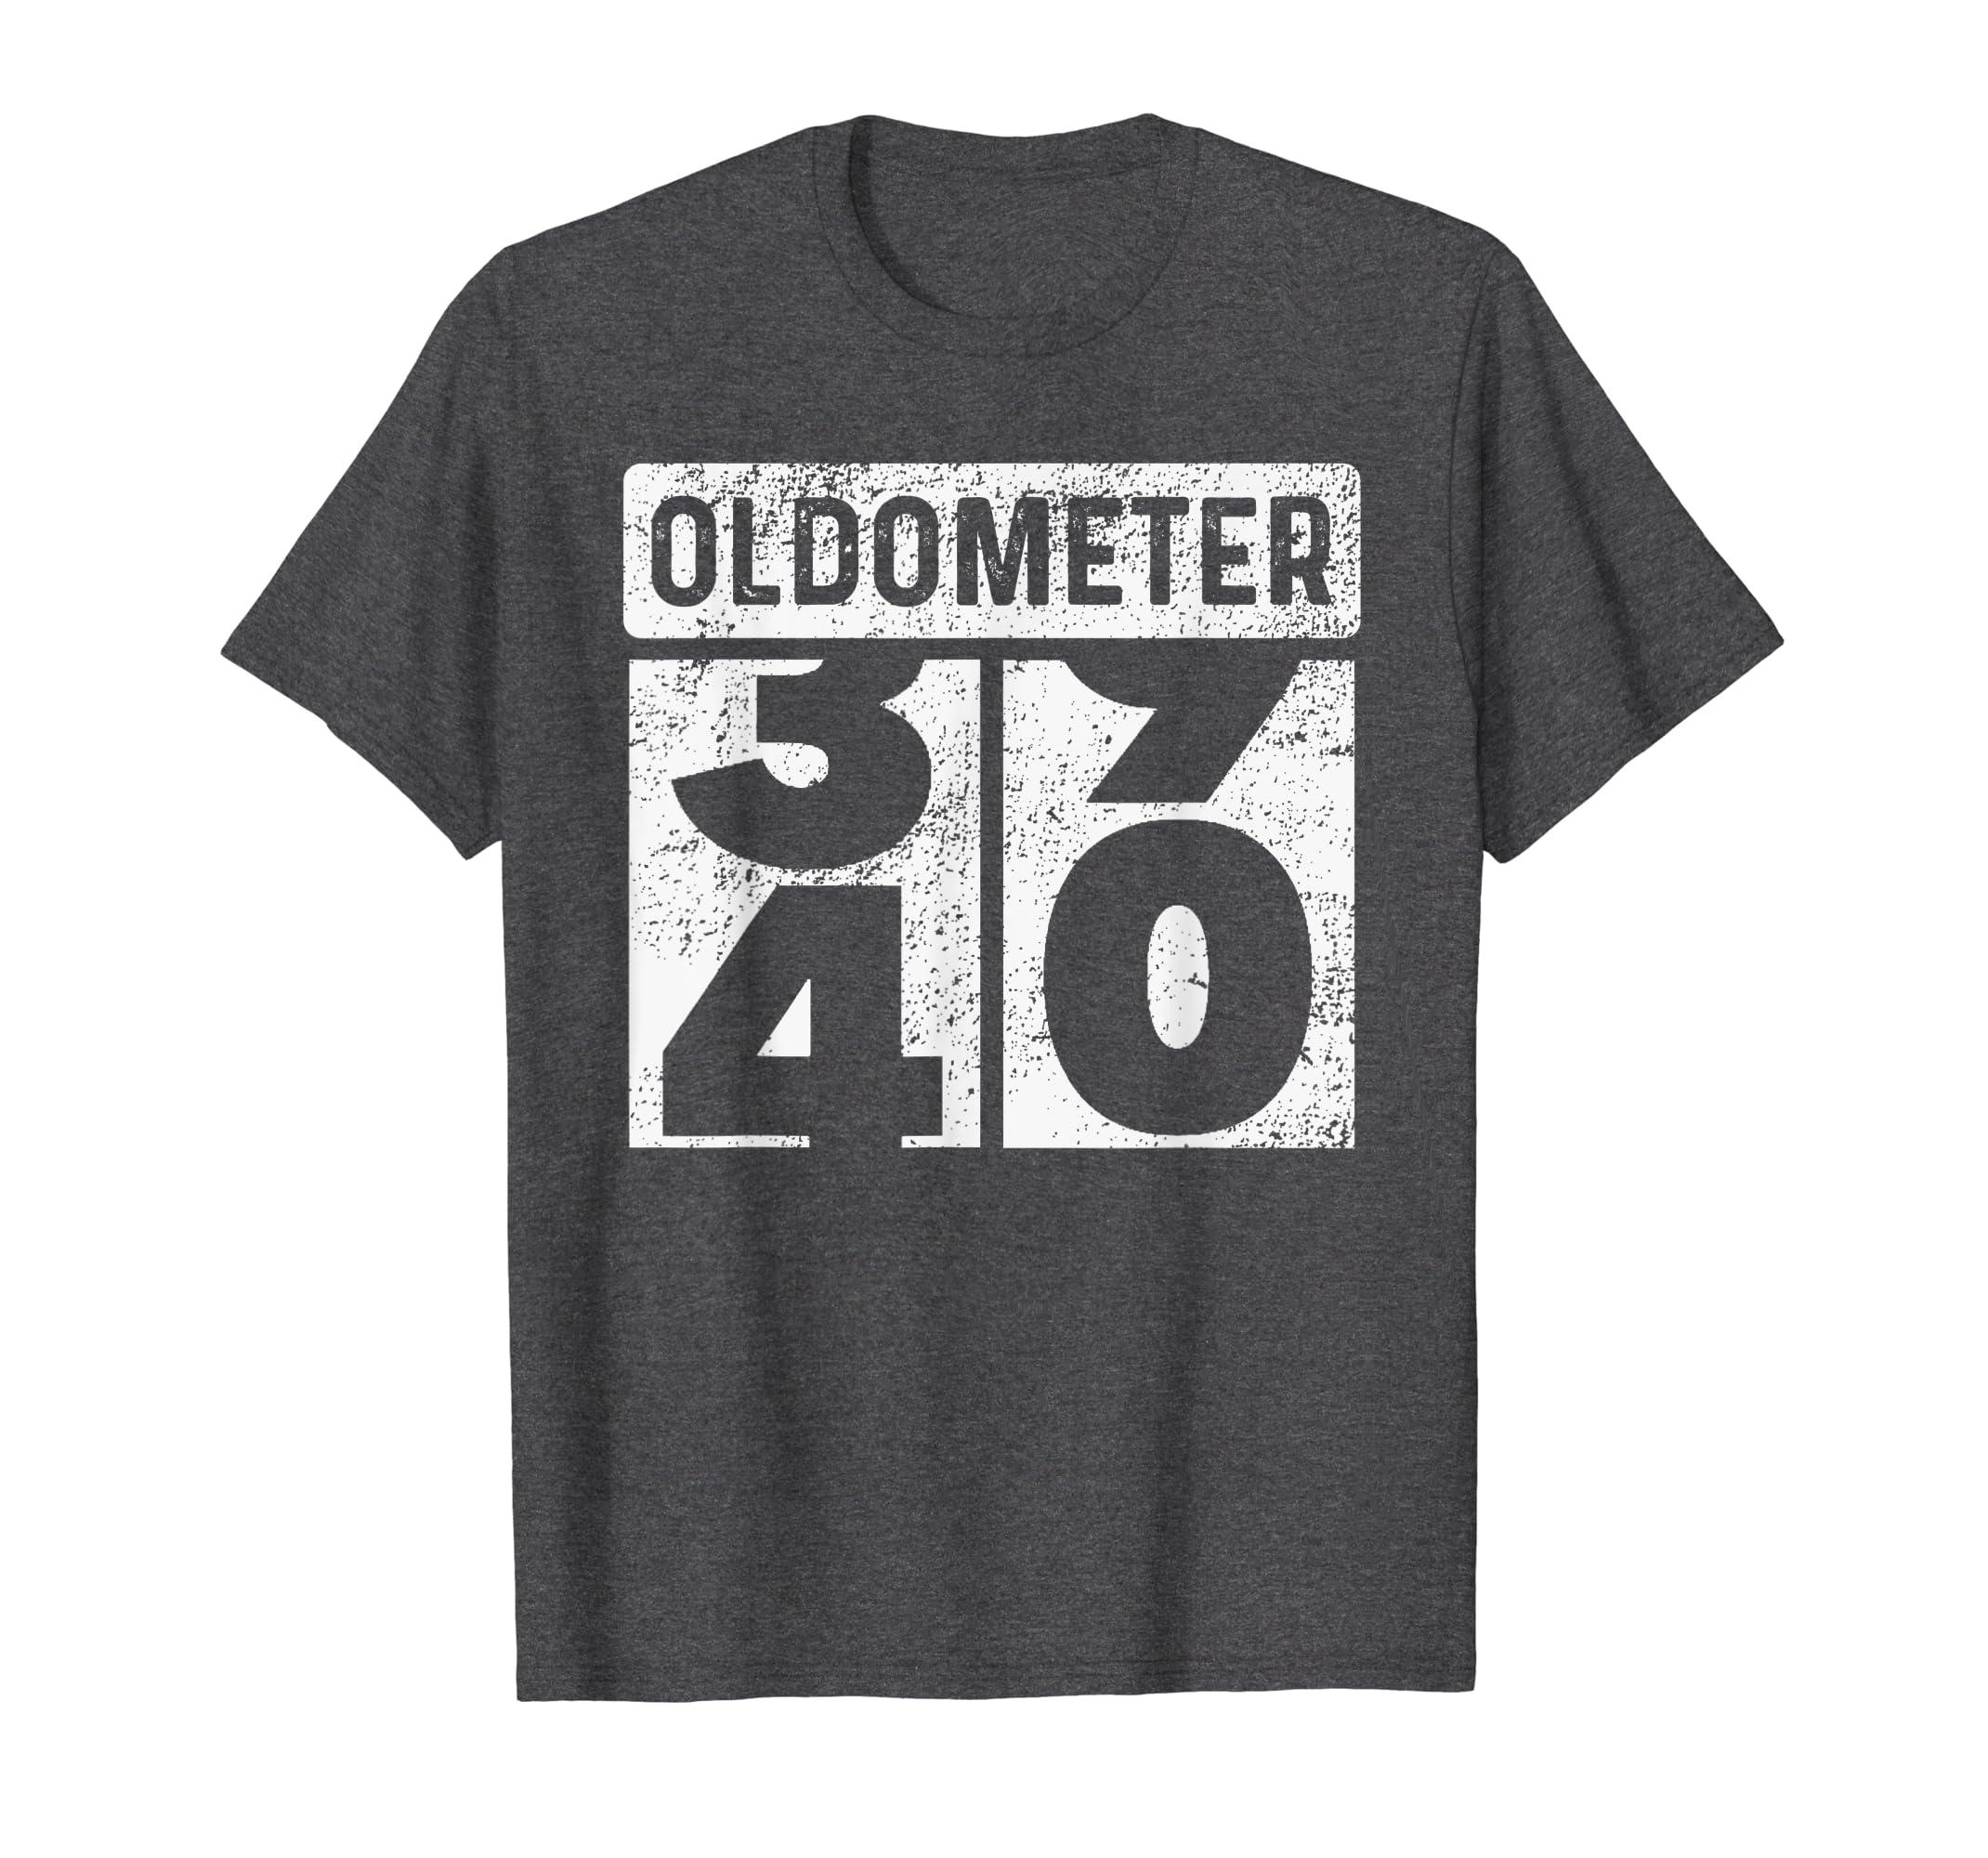 944ac084 Amazon.com: Oldometer Odometer Funny 40th Birthday Gift 40 yrs T-Shirt:  Clothing